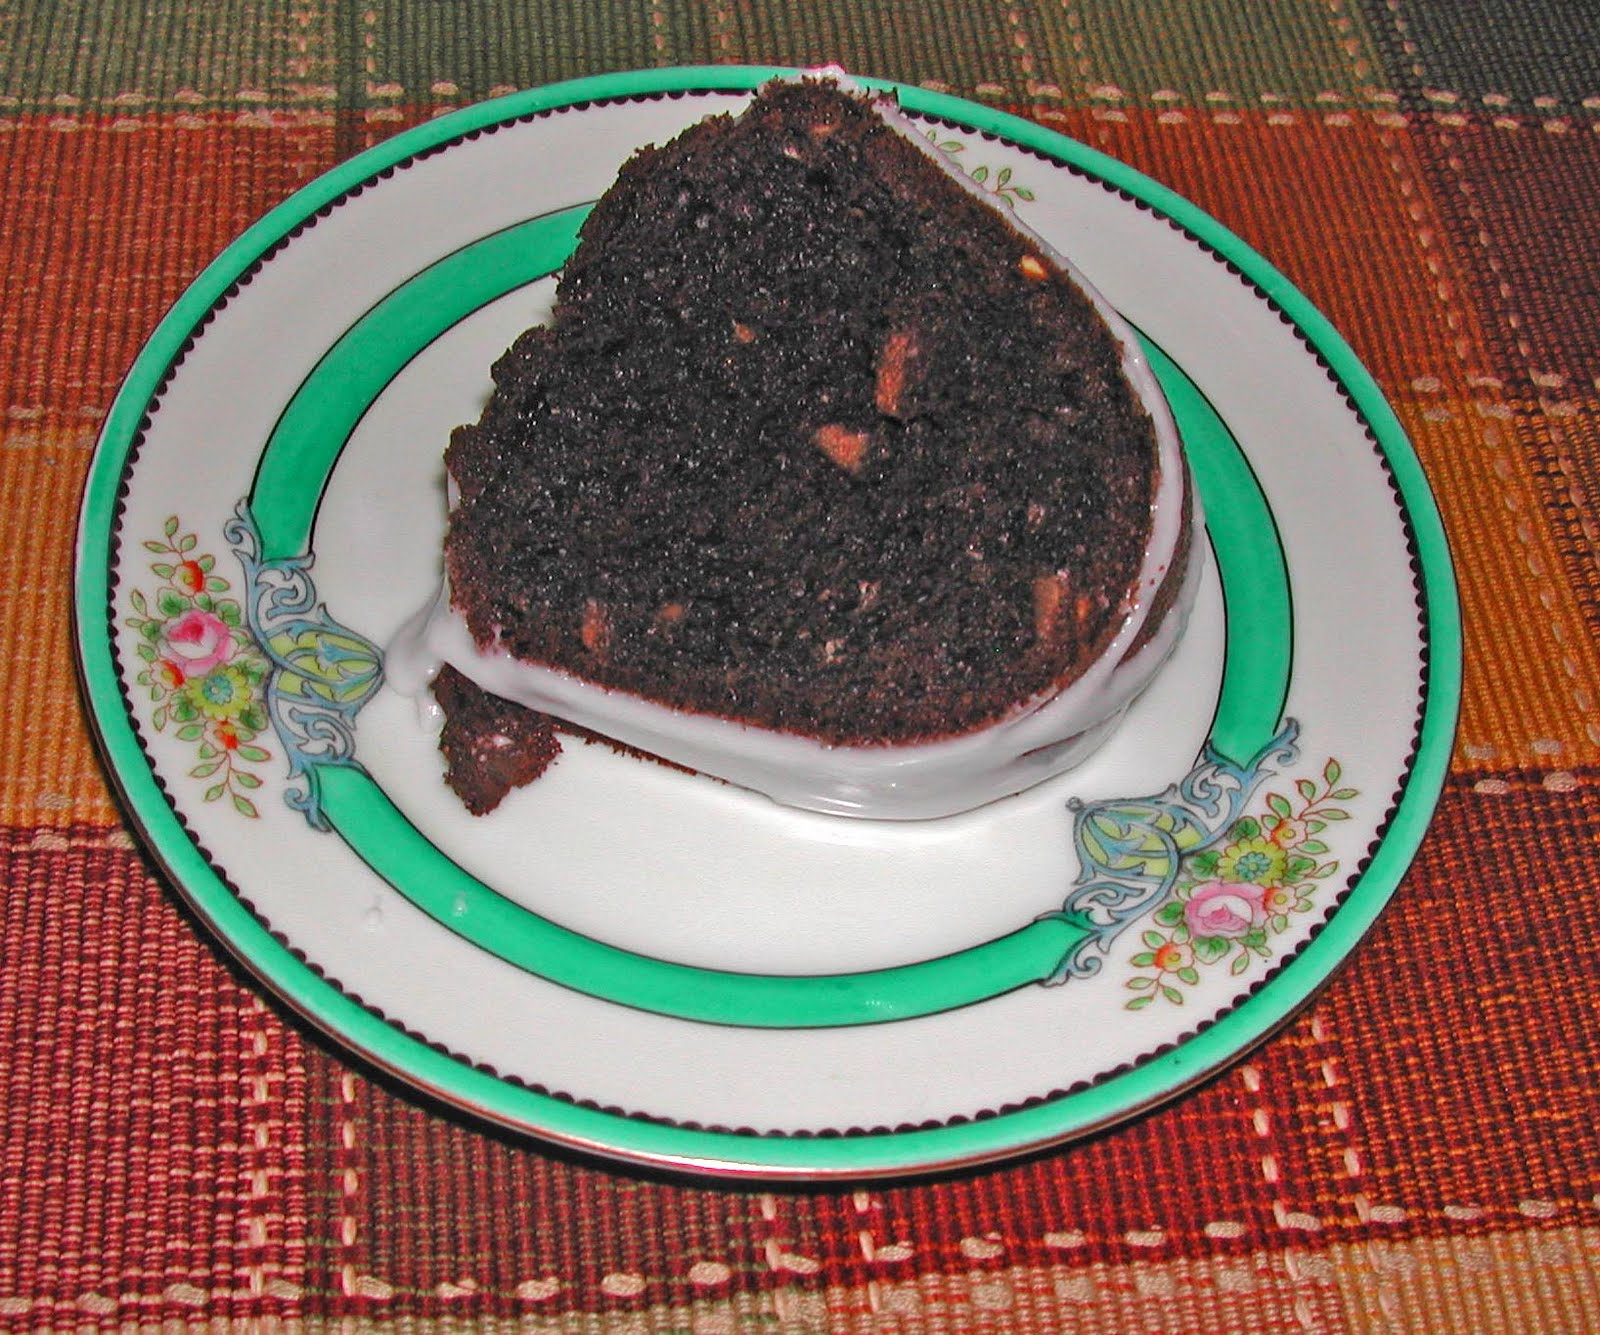 The Iowa Housewife: Chocolate Almond Pound Cake